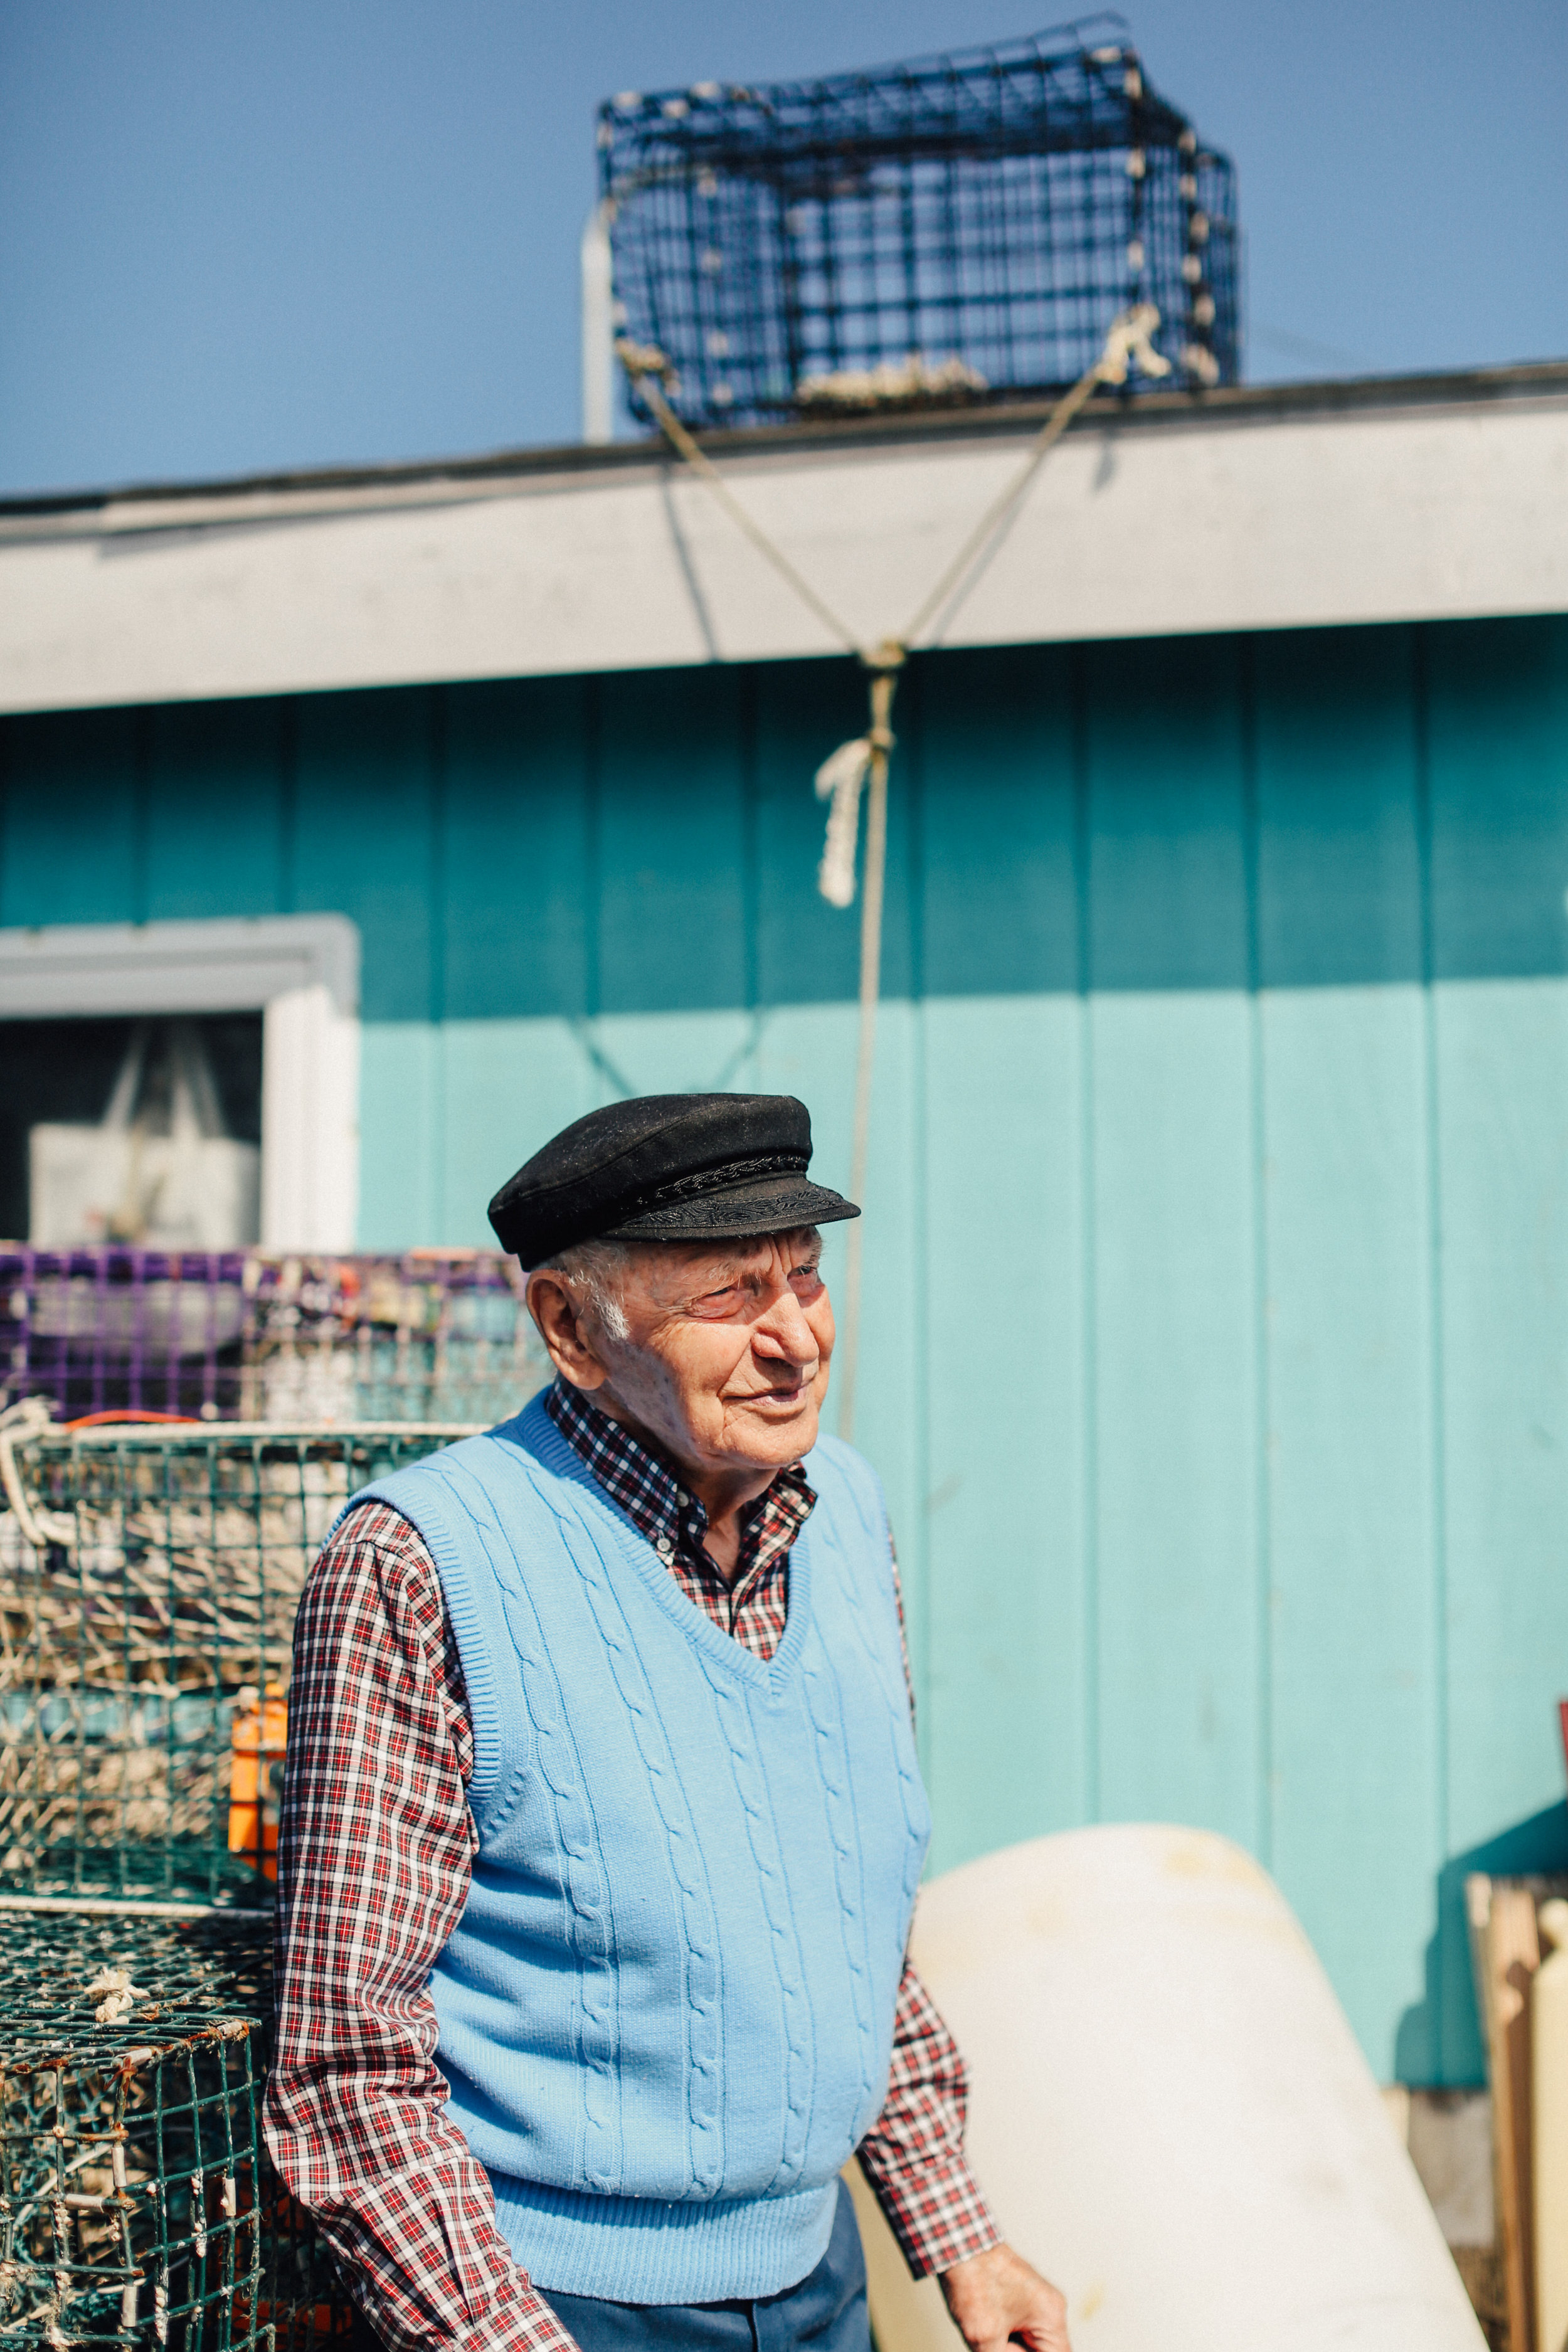 Leland Merrill on Widgery. Photo © Justin Levesque 2016